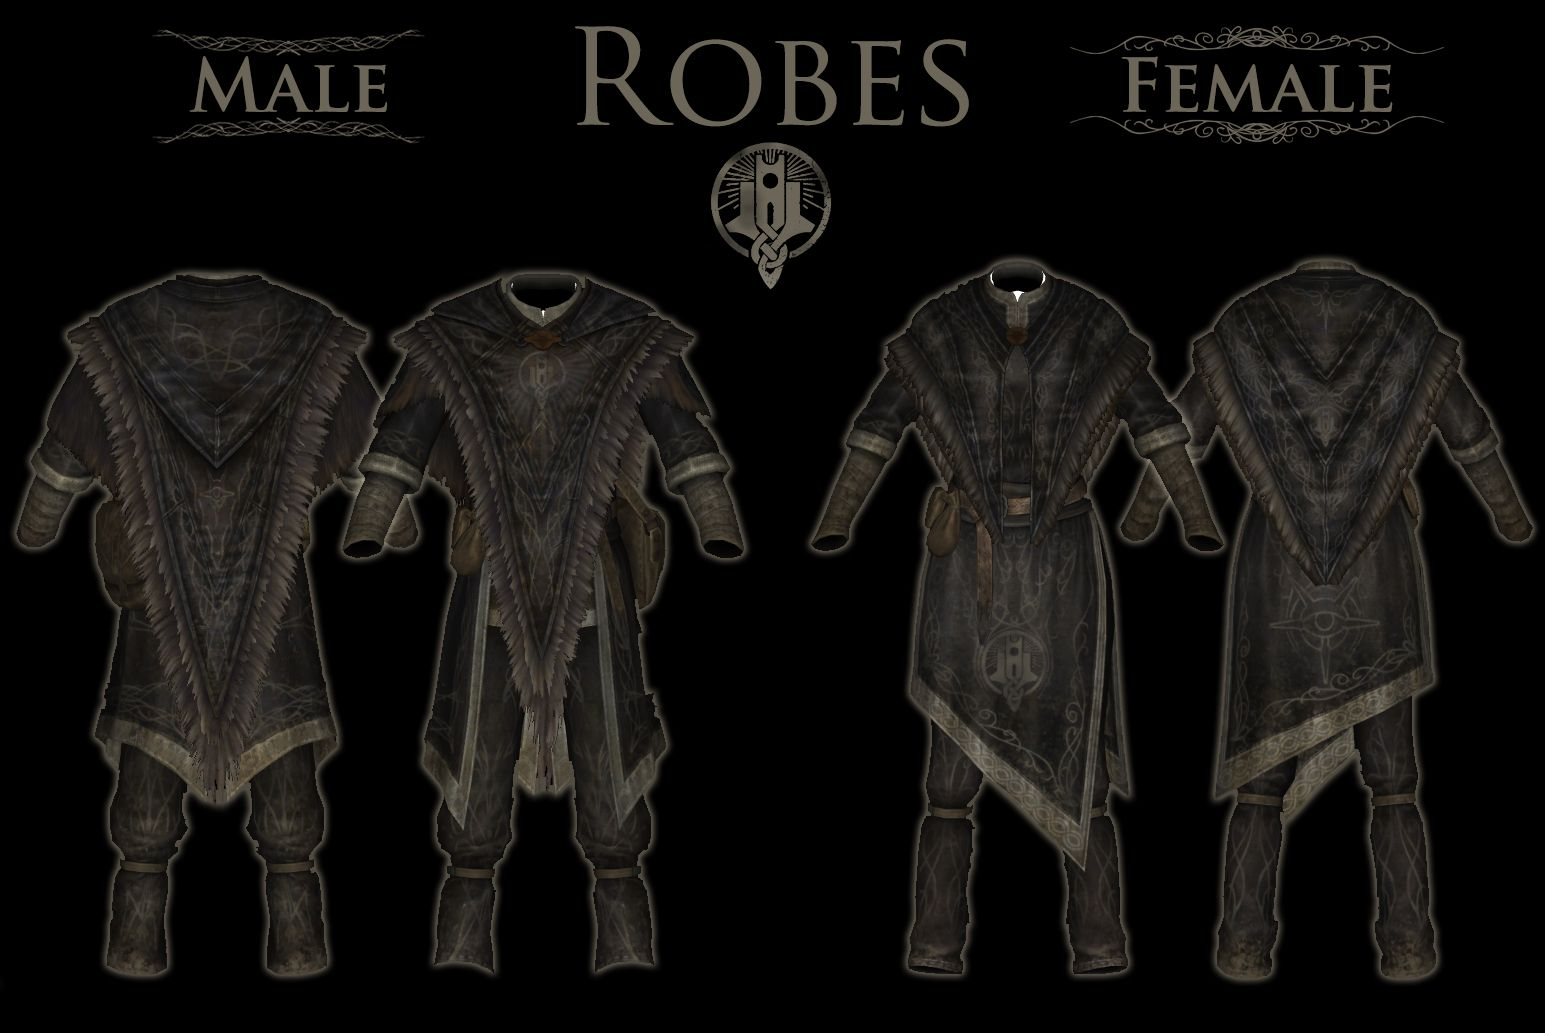 Archmage Of Winterhold Hd Retexture At Skyrim Nexus Mods And Community Skyrim Skyrim Nexus Mods Elder Scrolls